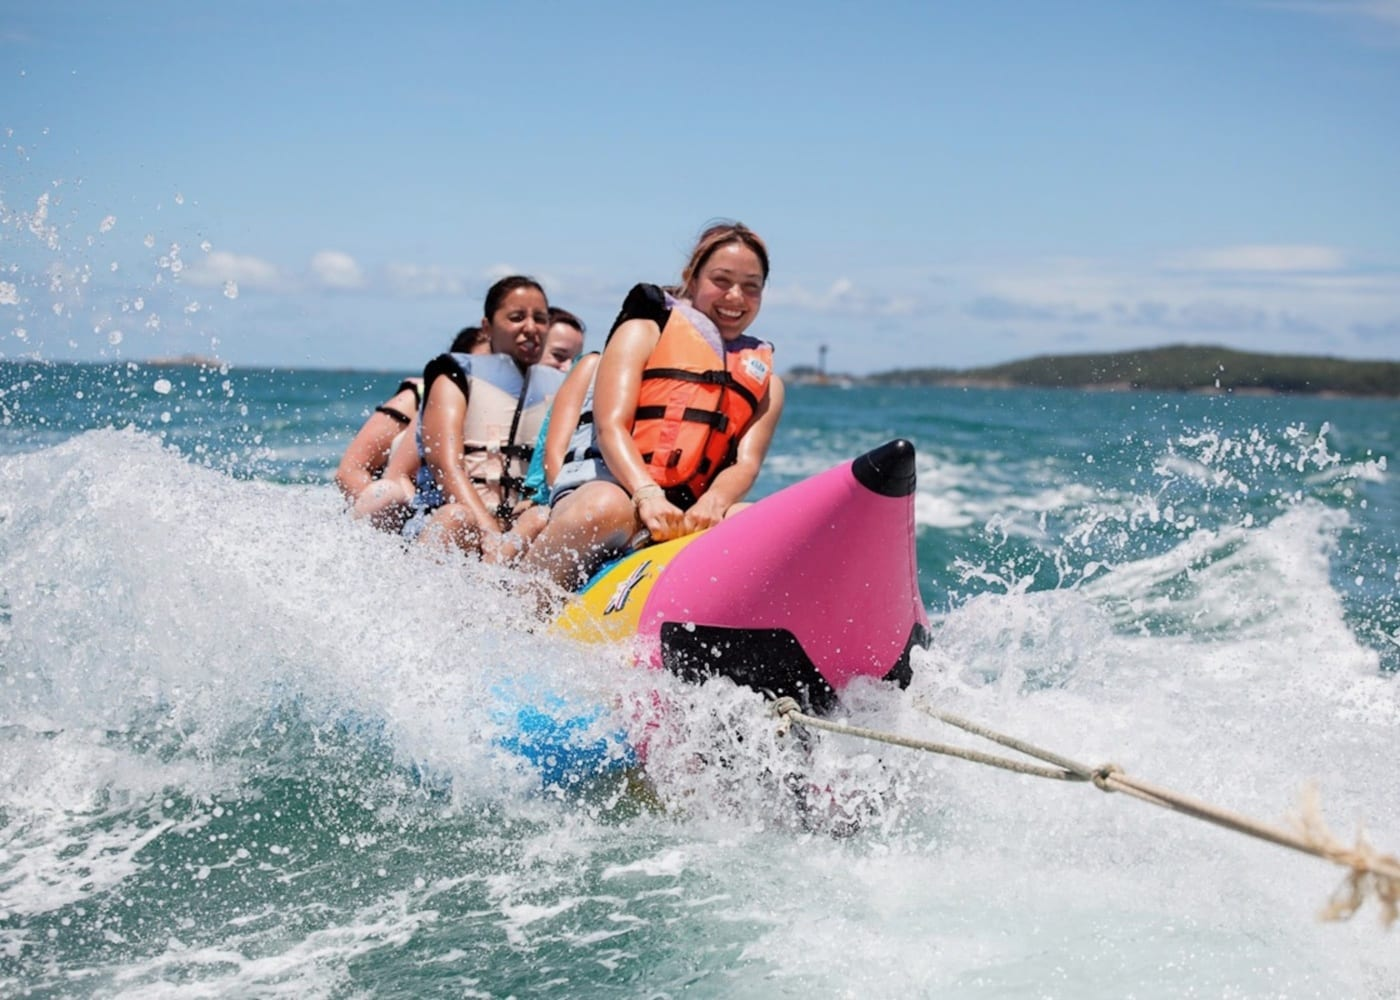 Banana Boat Rides - fun water sports in Bali, Indonesia